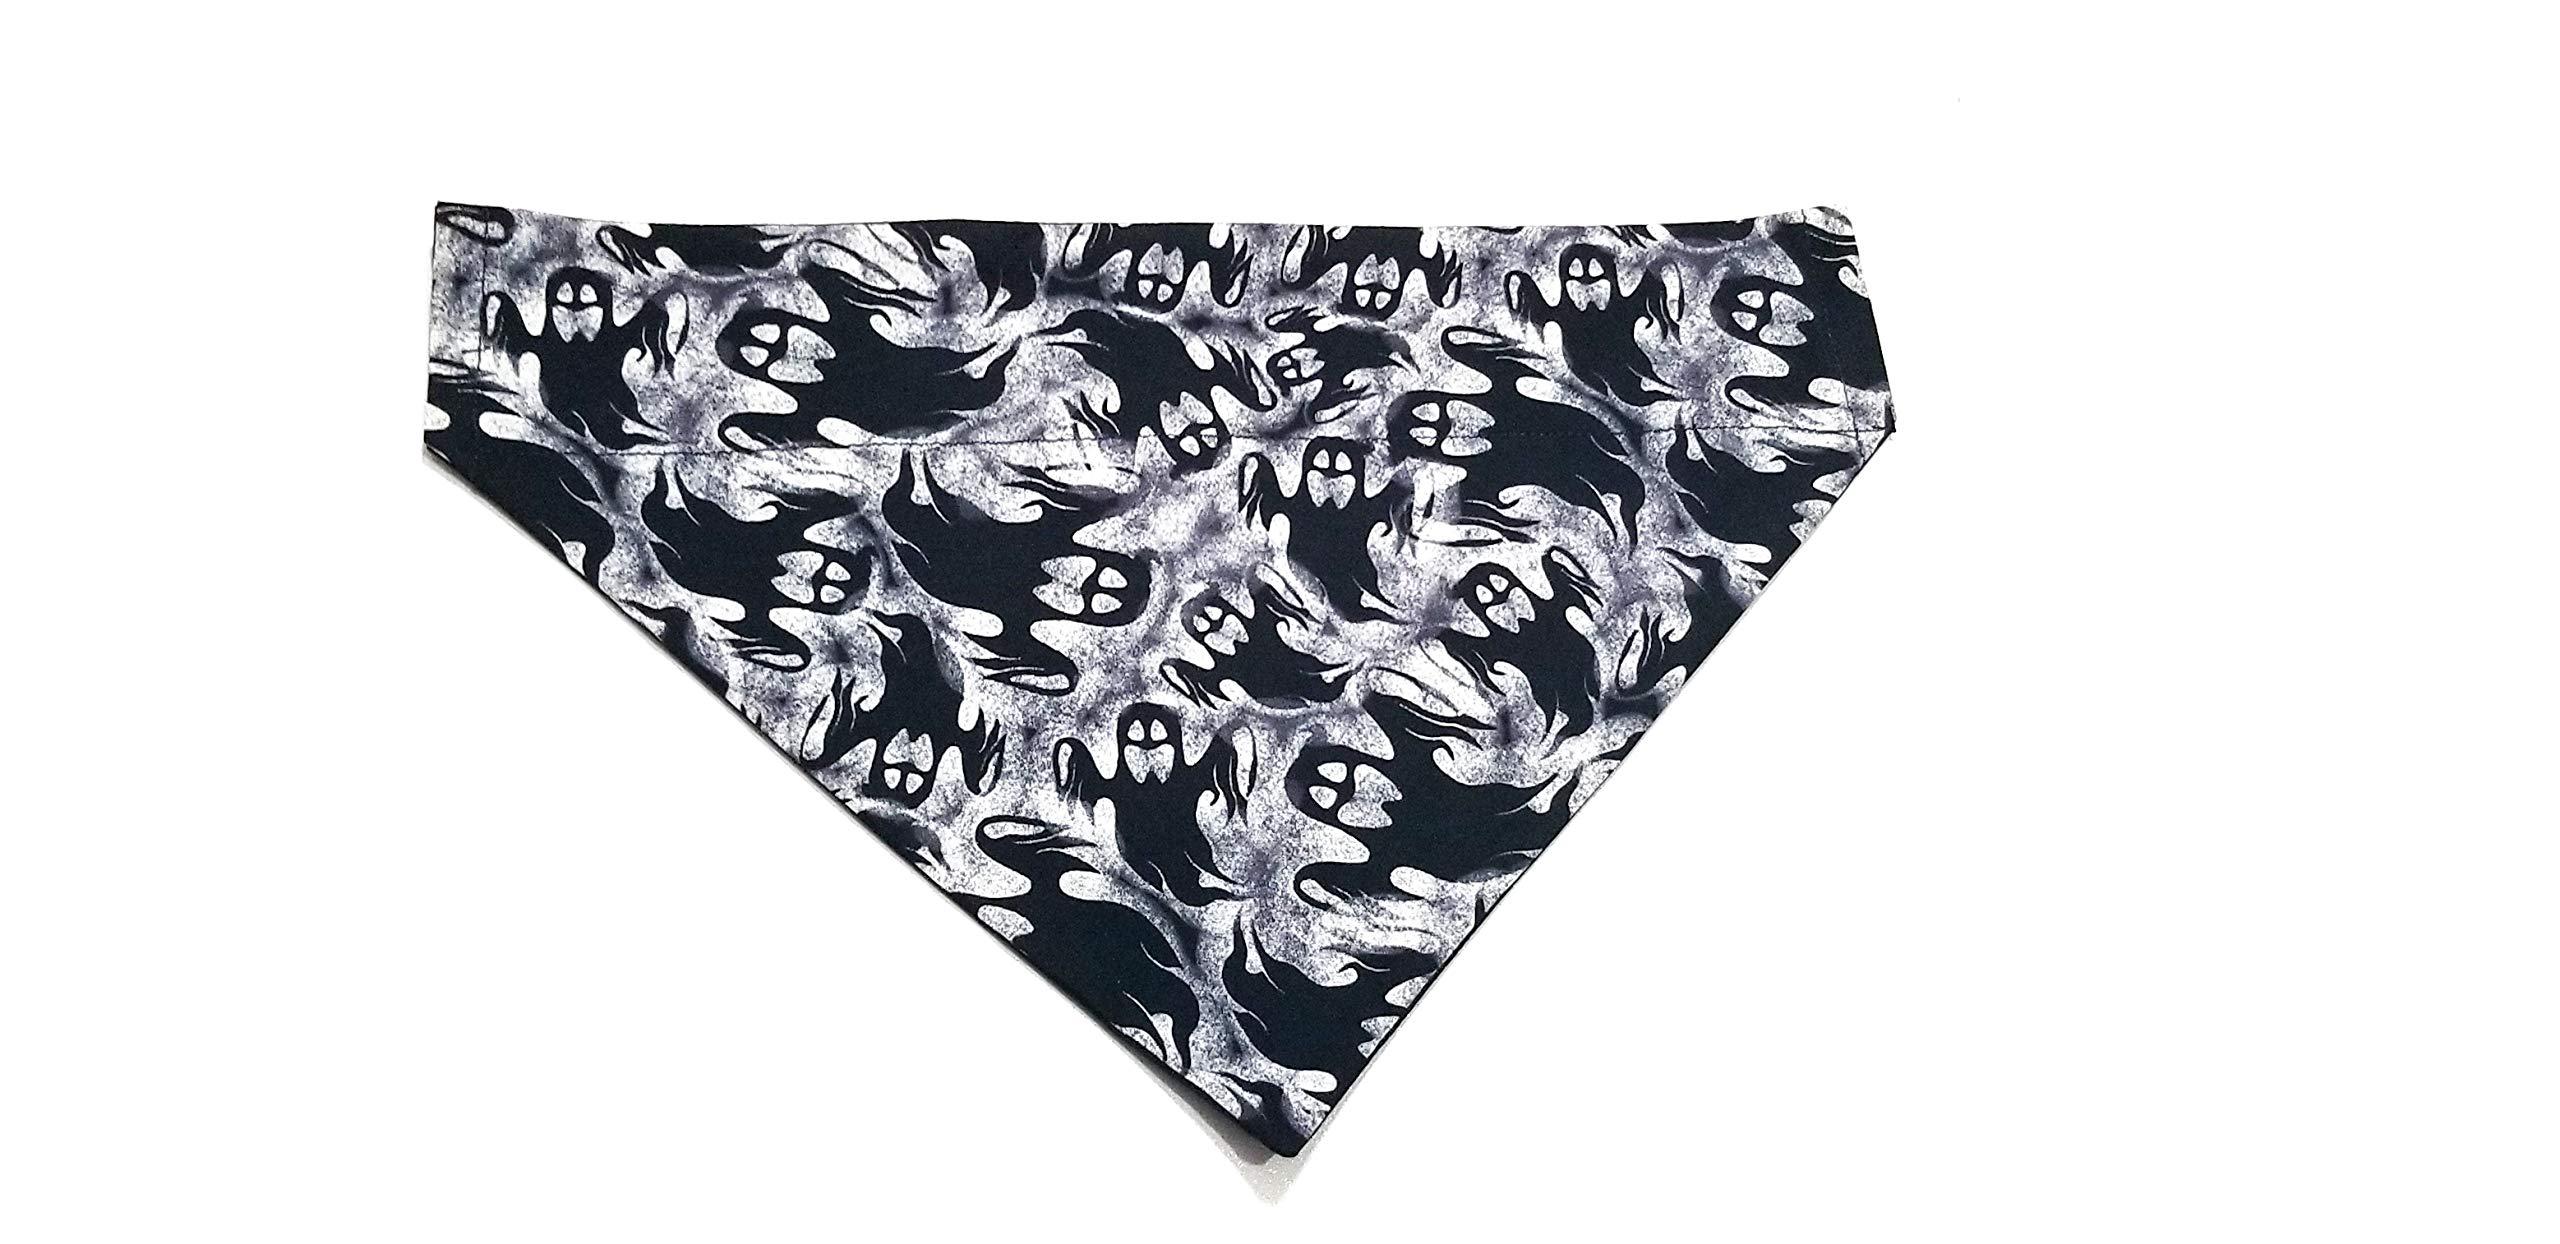 Ghost Black Halloween Print Dog Bandana Kerchief No-Tie Design